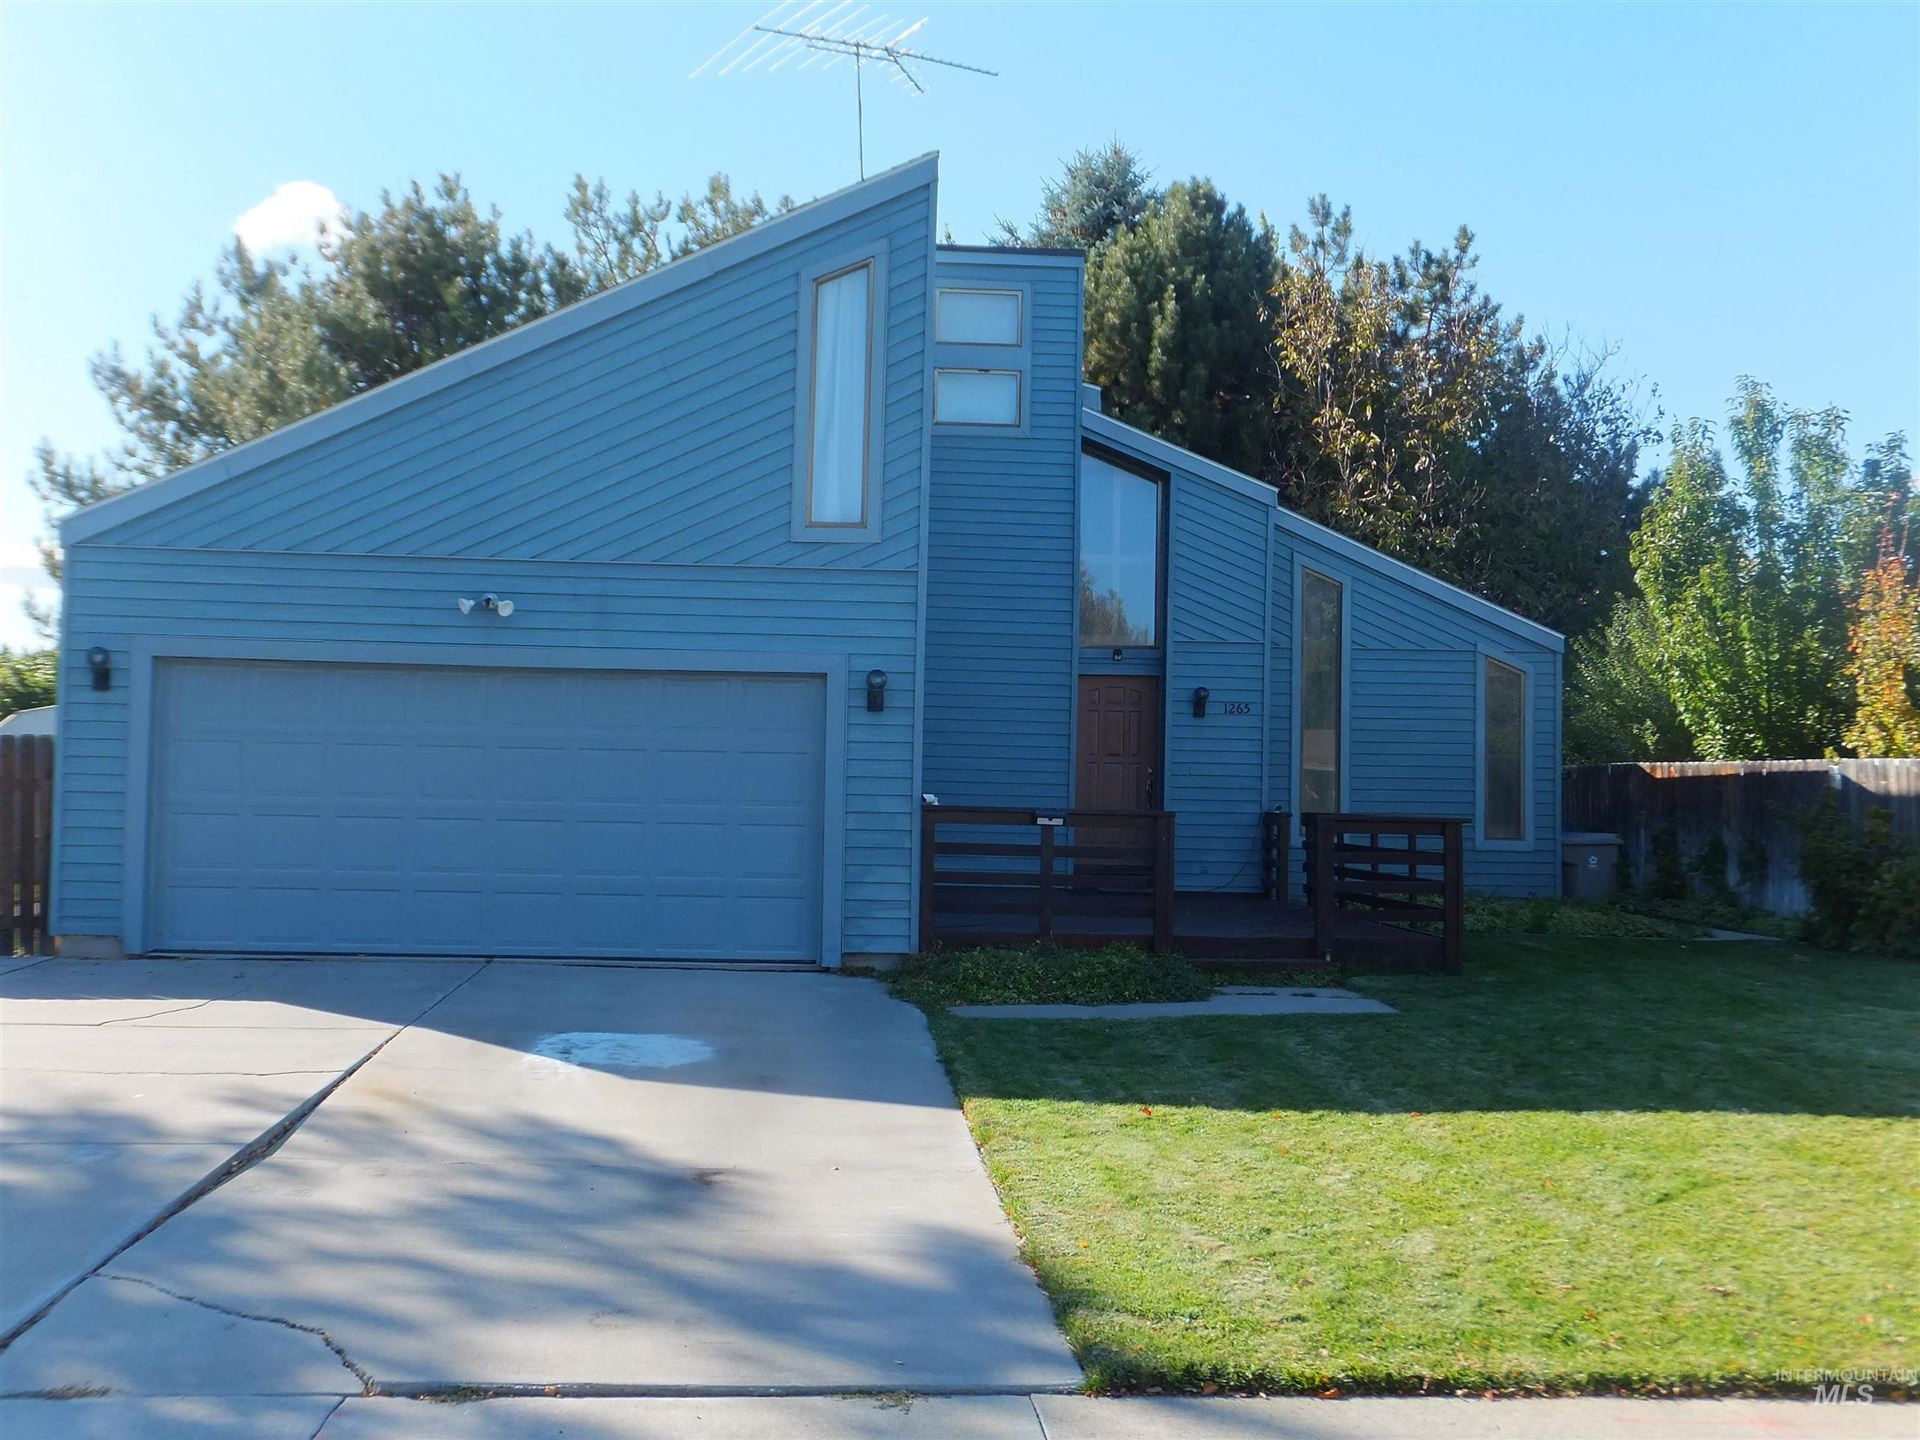 1265 Owyhee Ct., Mountain Home, ID 83647 - MLS#: 98822620